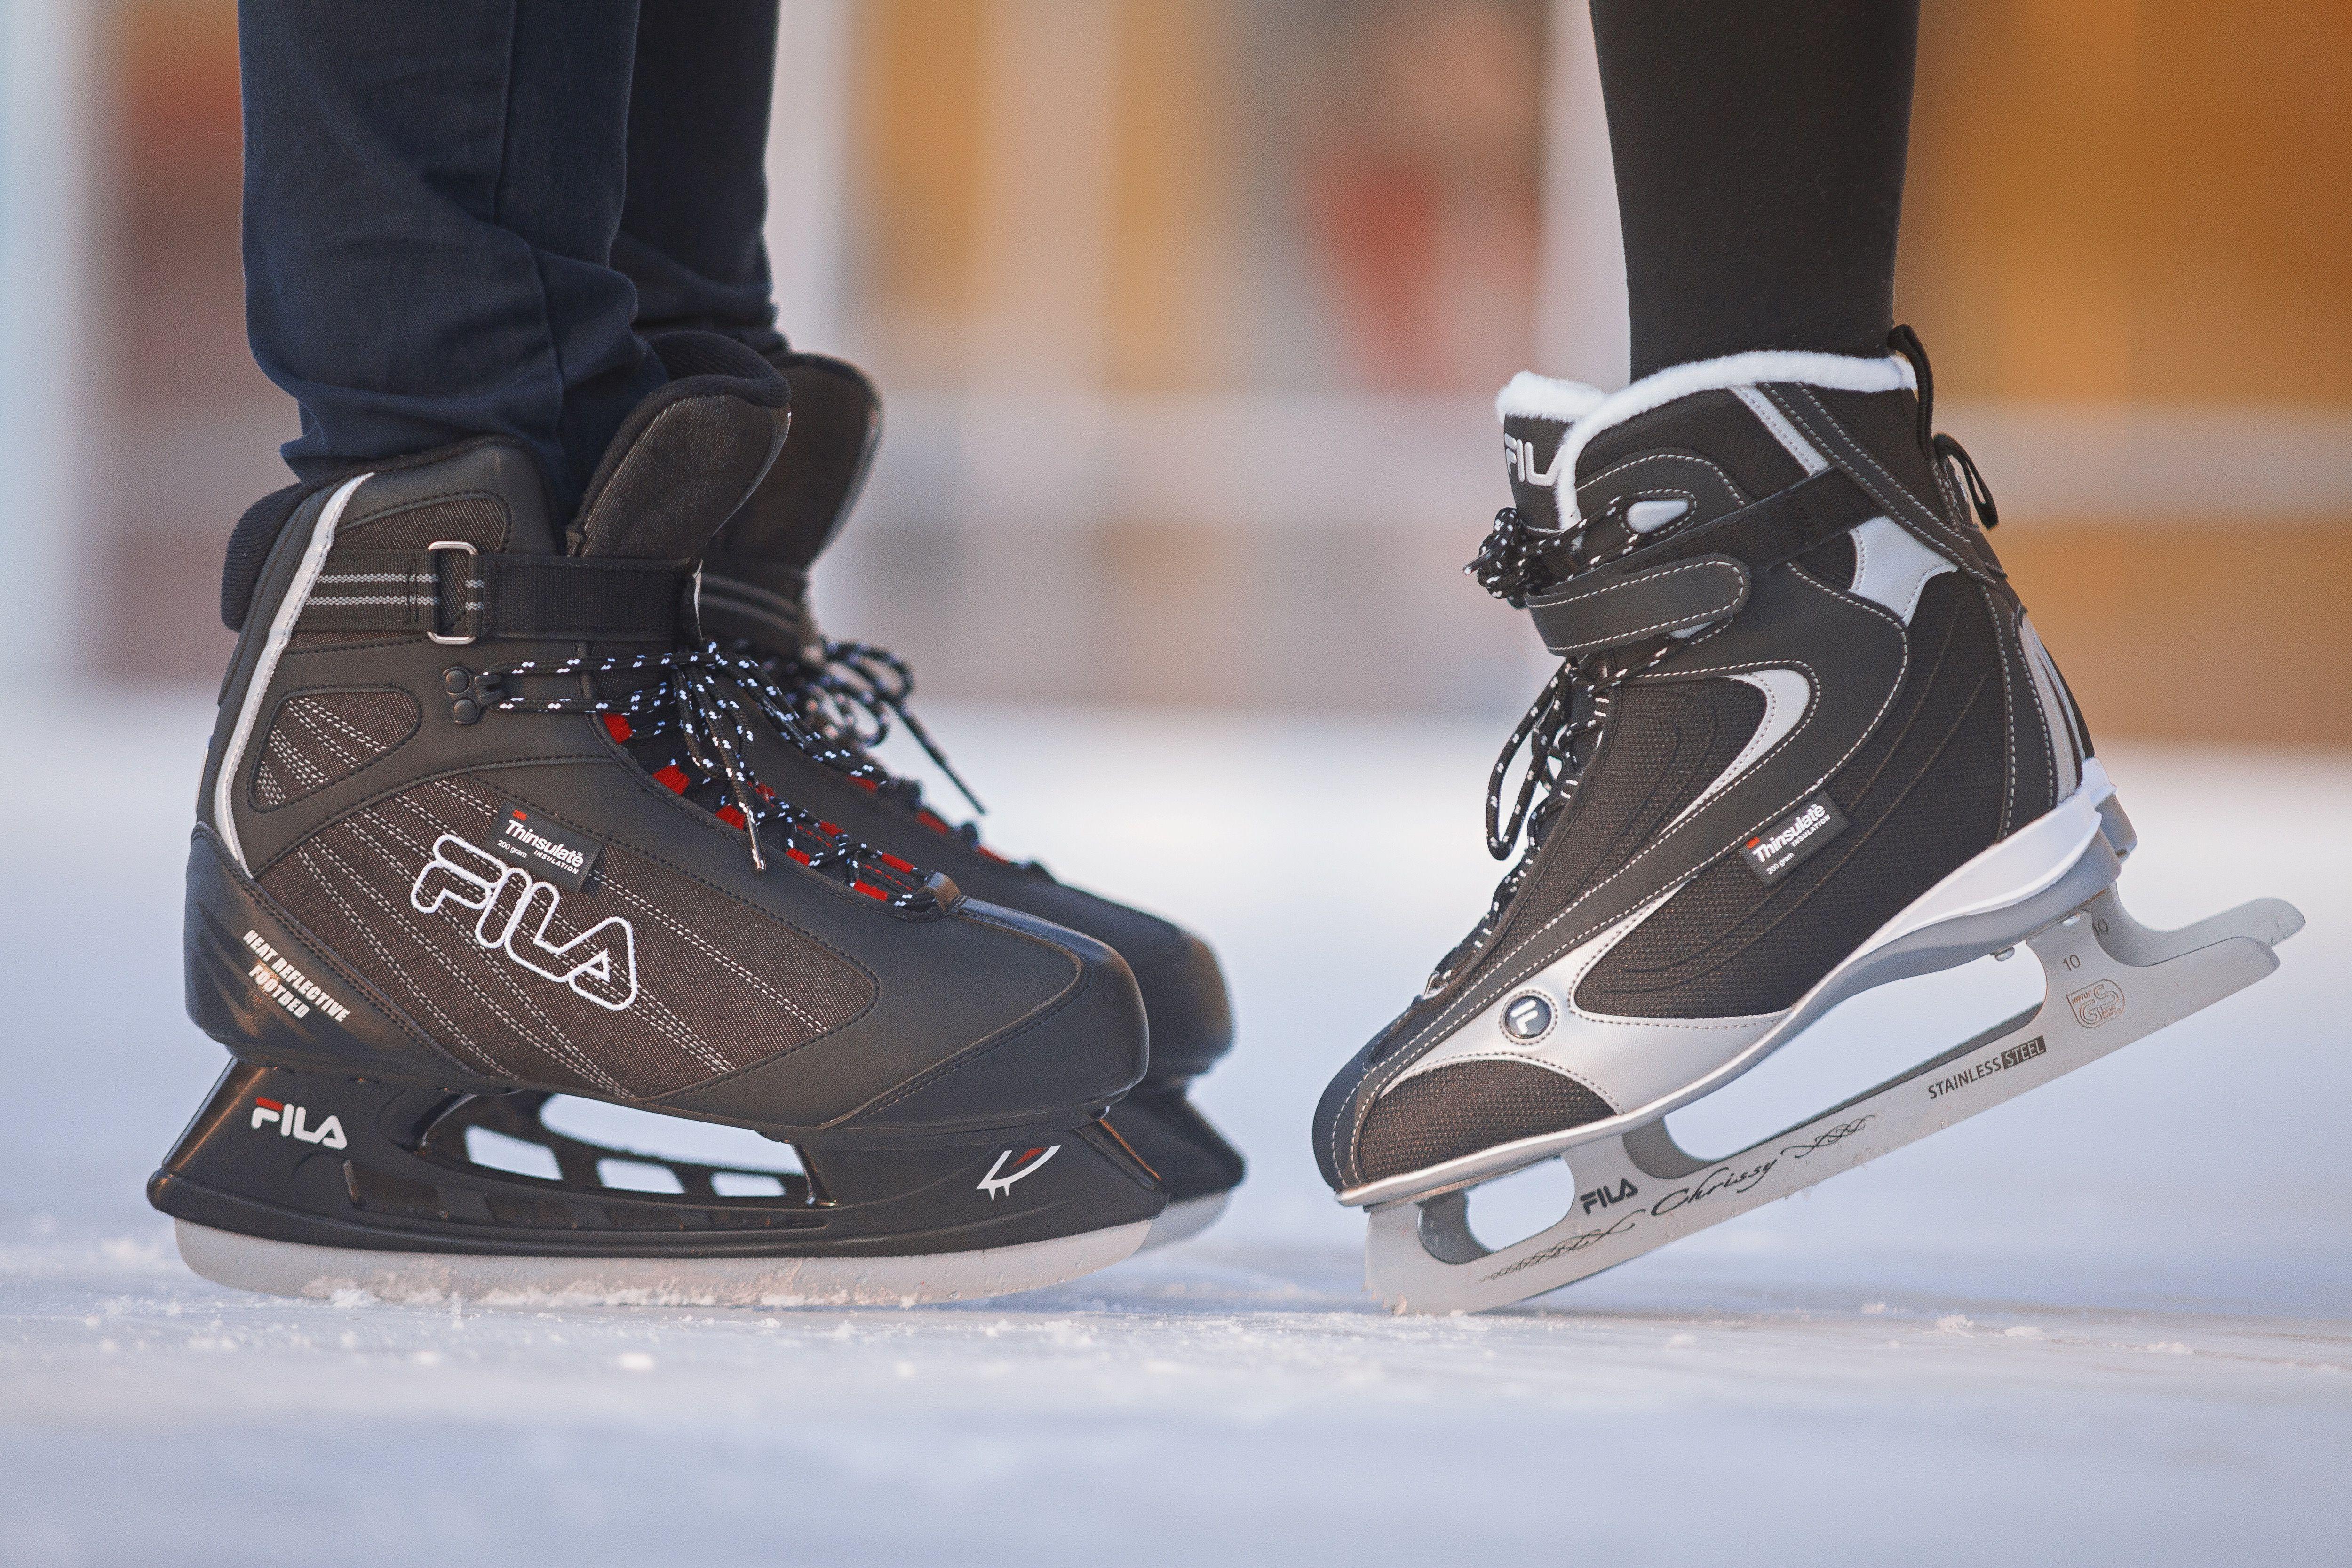 38c77ef55b7b Winter mood  skates  ice  skating  fila  chrissy  justin